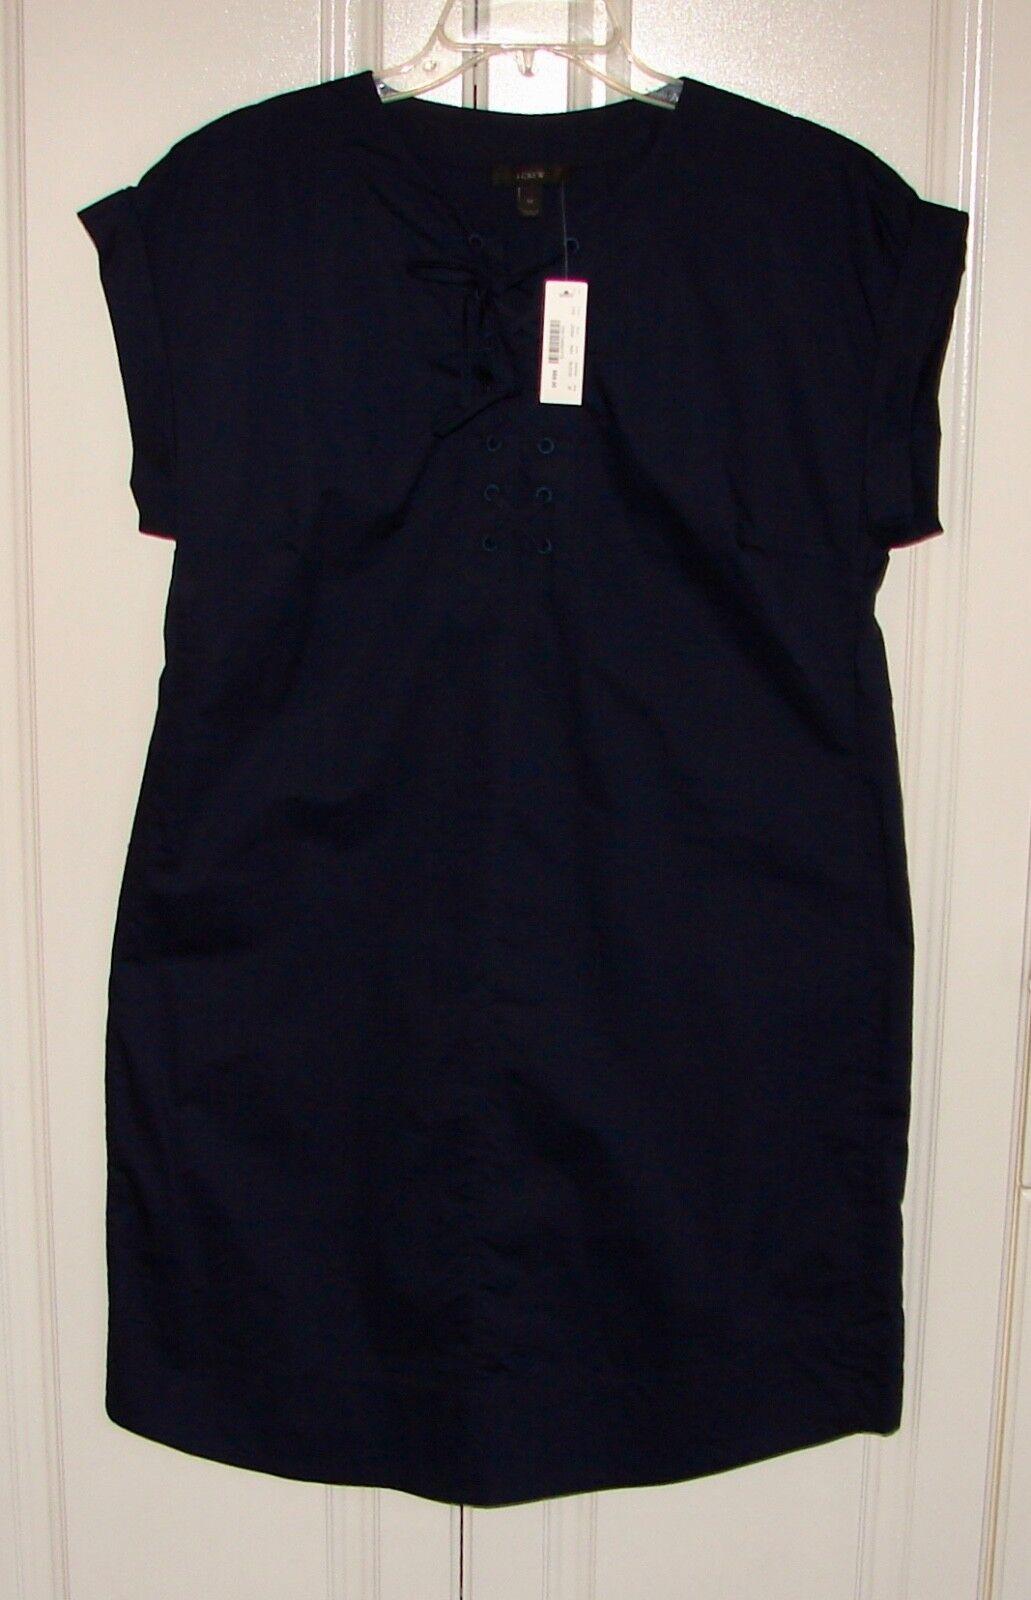 NWT J Crew sz M navy Blau lace up cotton shift dress  G5359